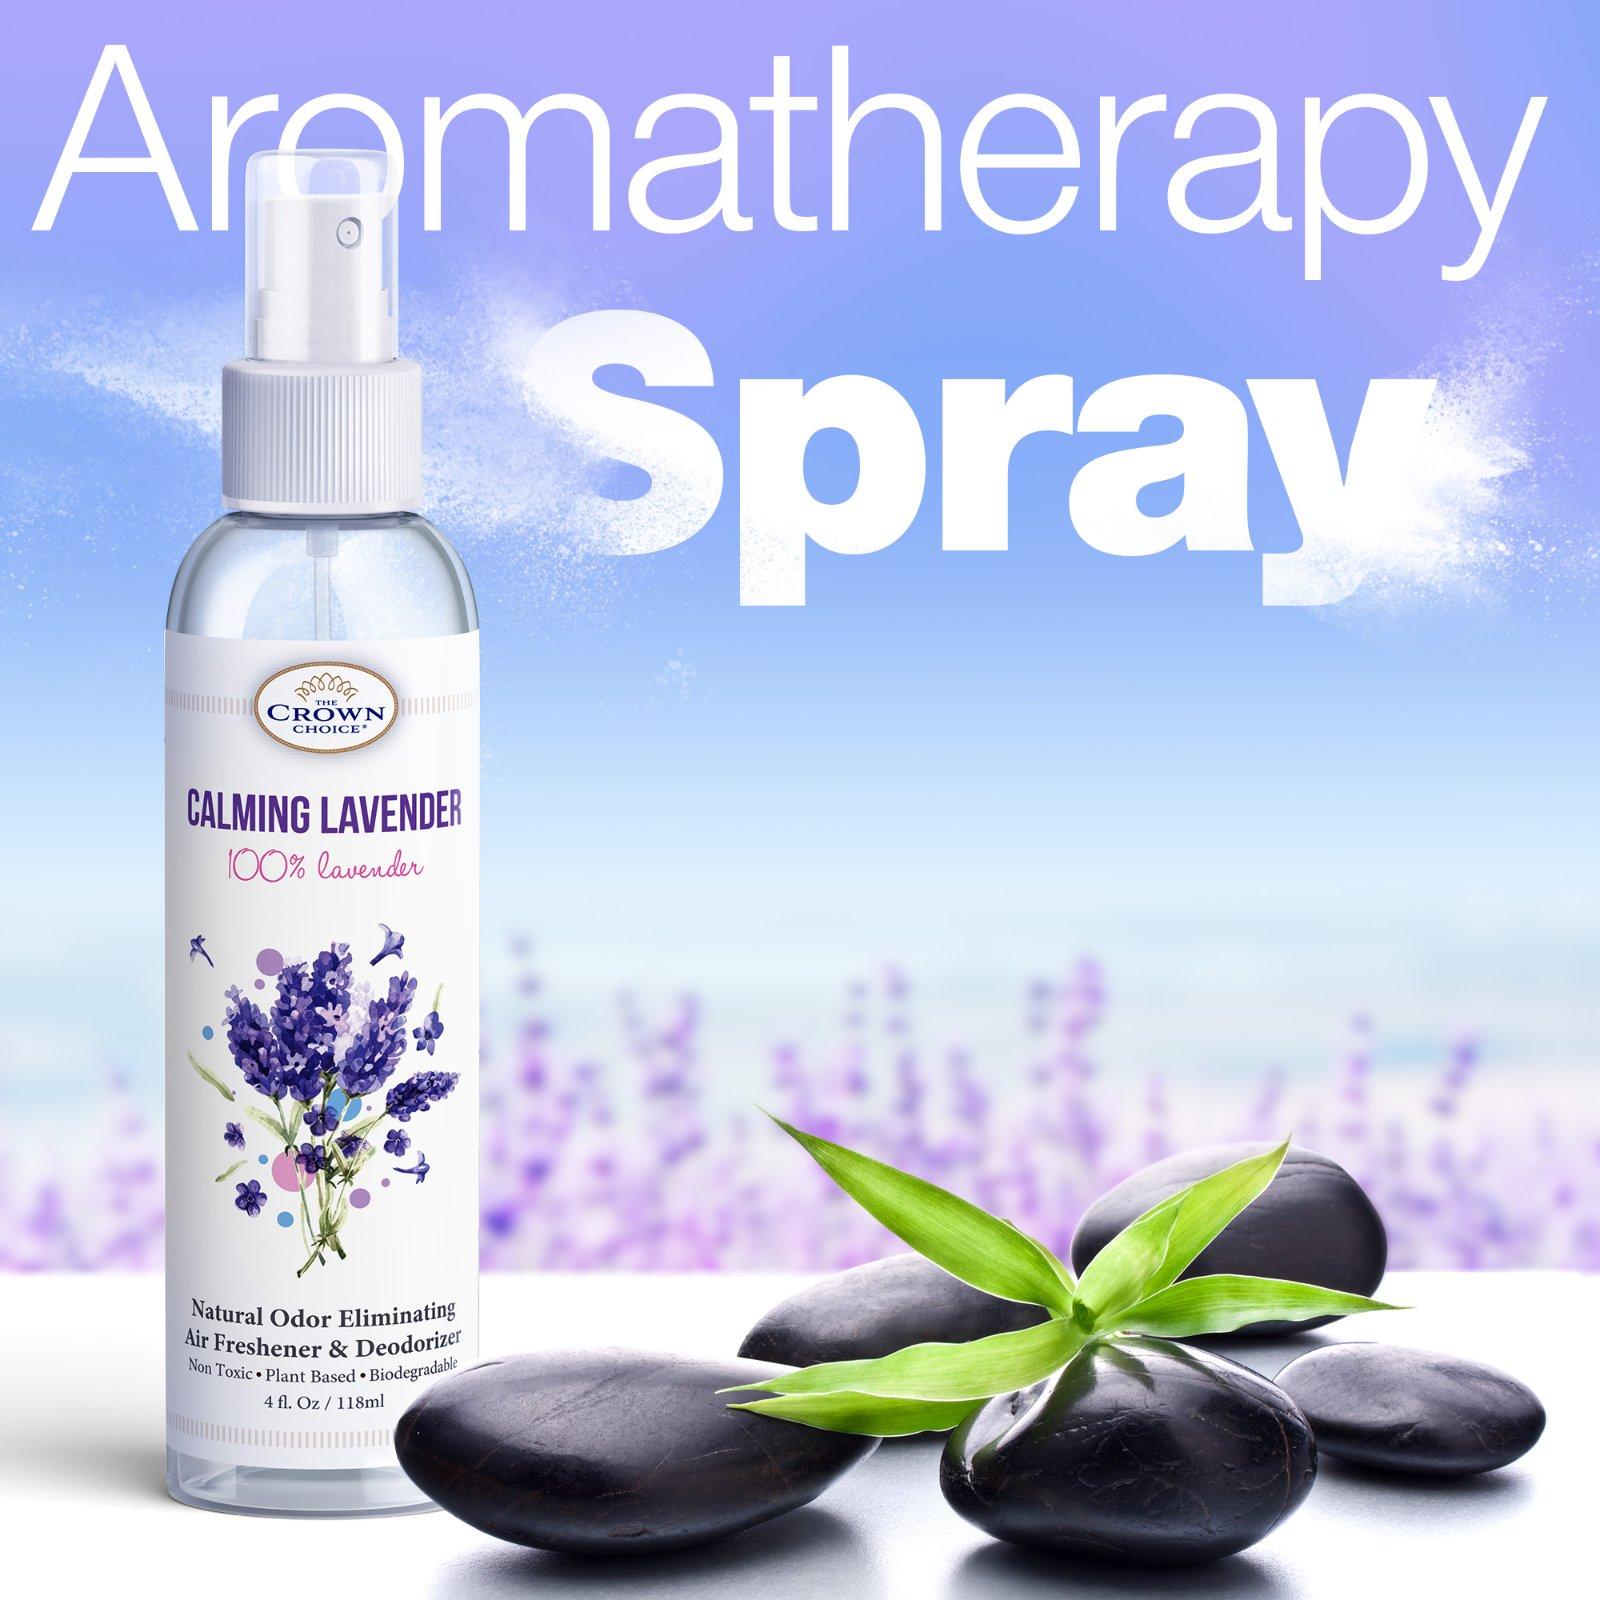 Natural Home Deodorizer and DIY Air Freshener Ideas 1